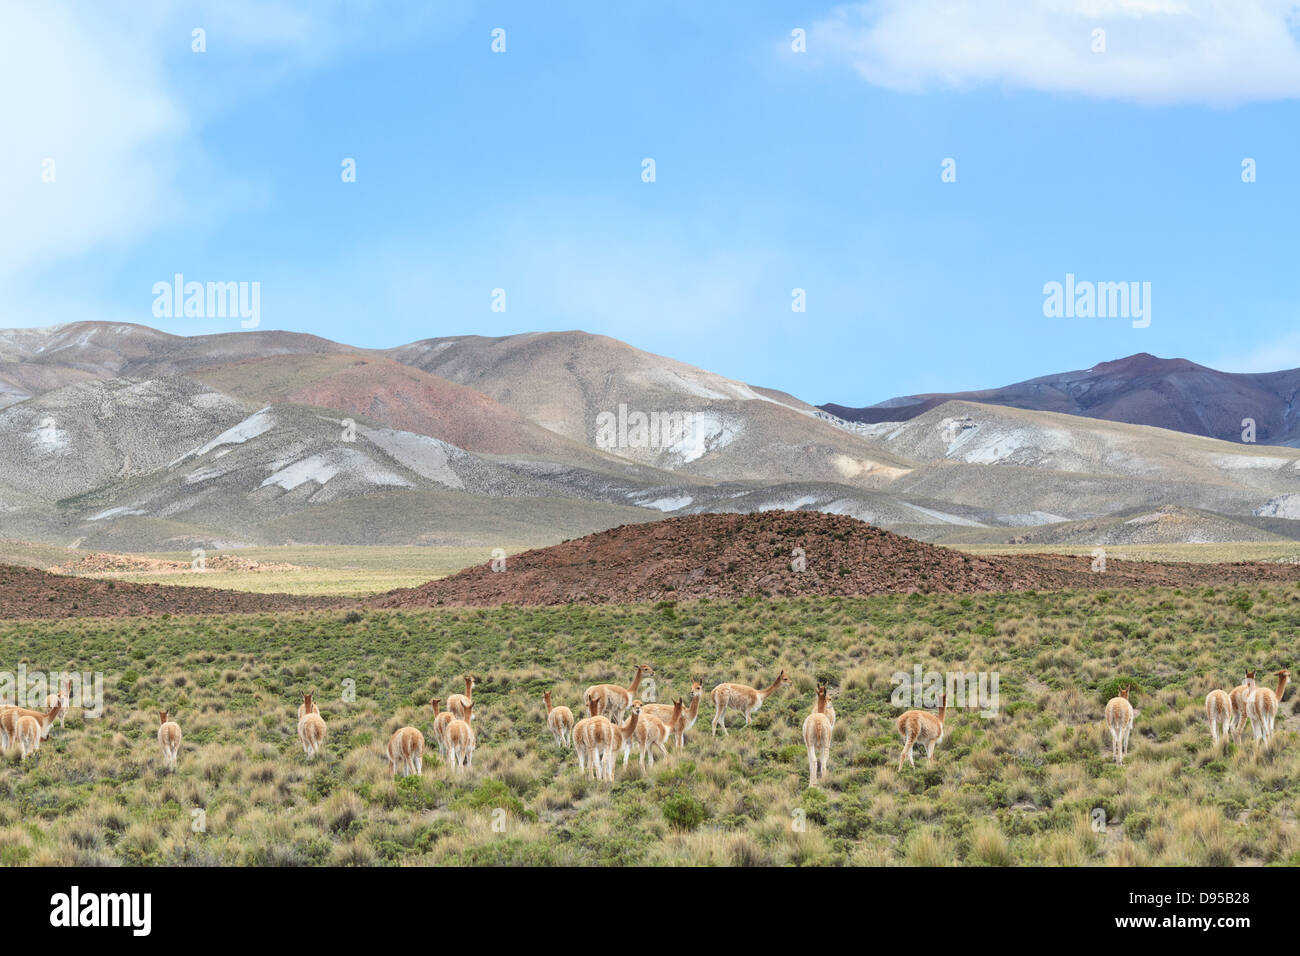 Vicunas, Salt Flat Tours, Altiplano, Southwest Bolivia - Stock Image